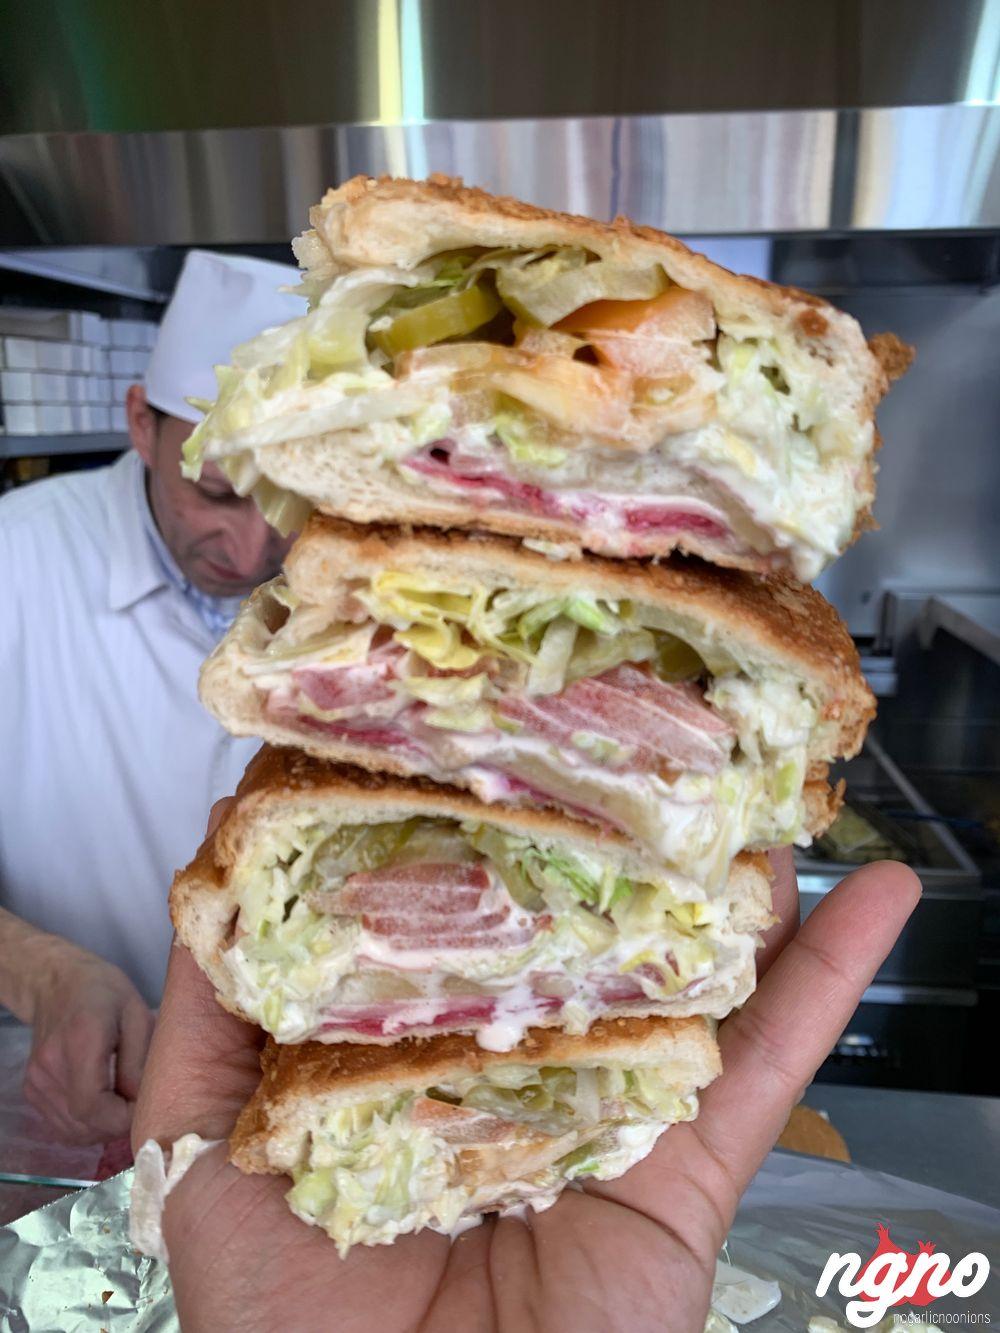 j-makhlouf-dora-sandwiches-nogarlicnoonions-282019-02-22-09-49-29